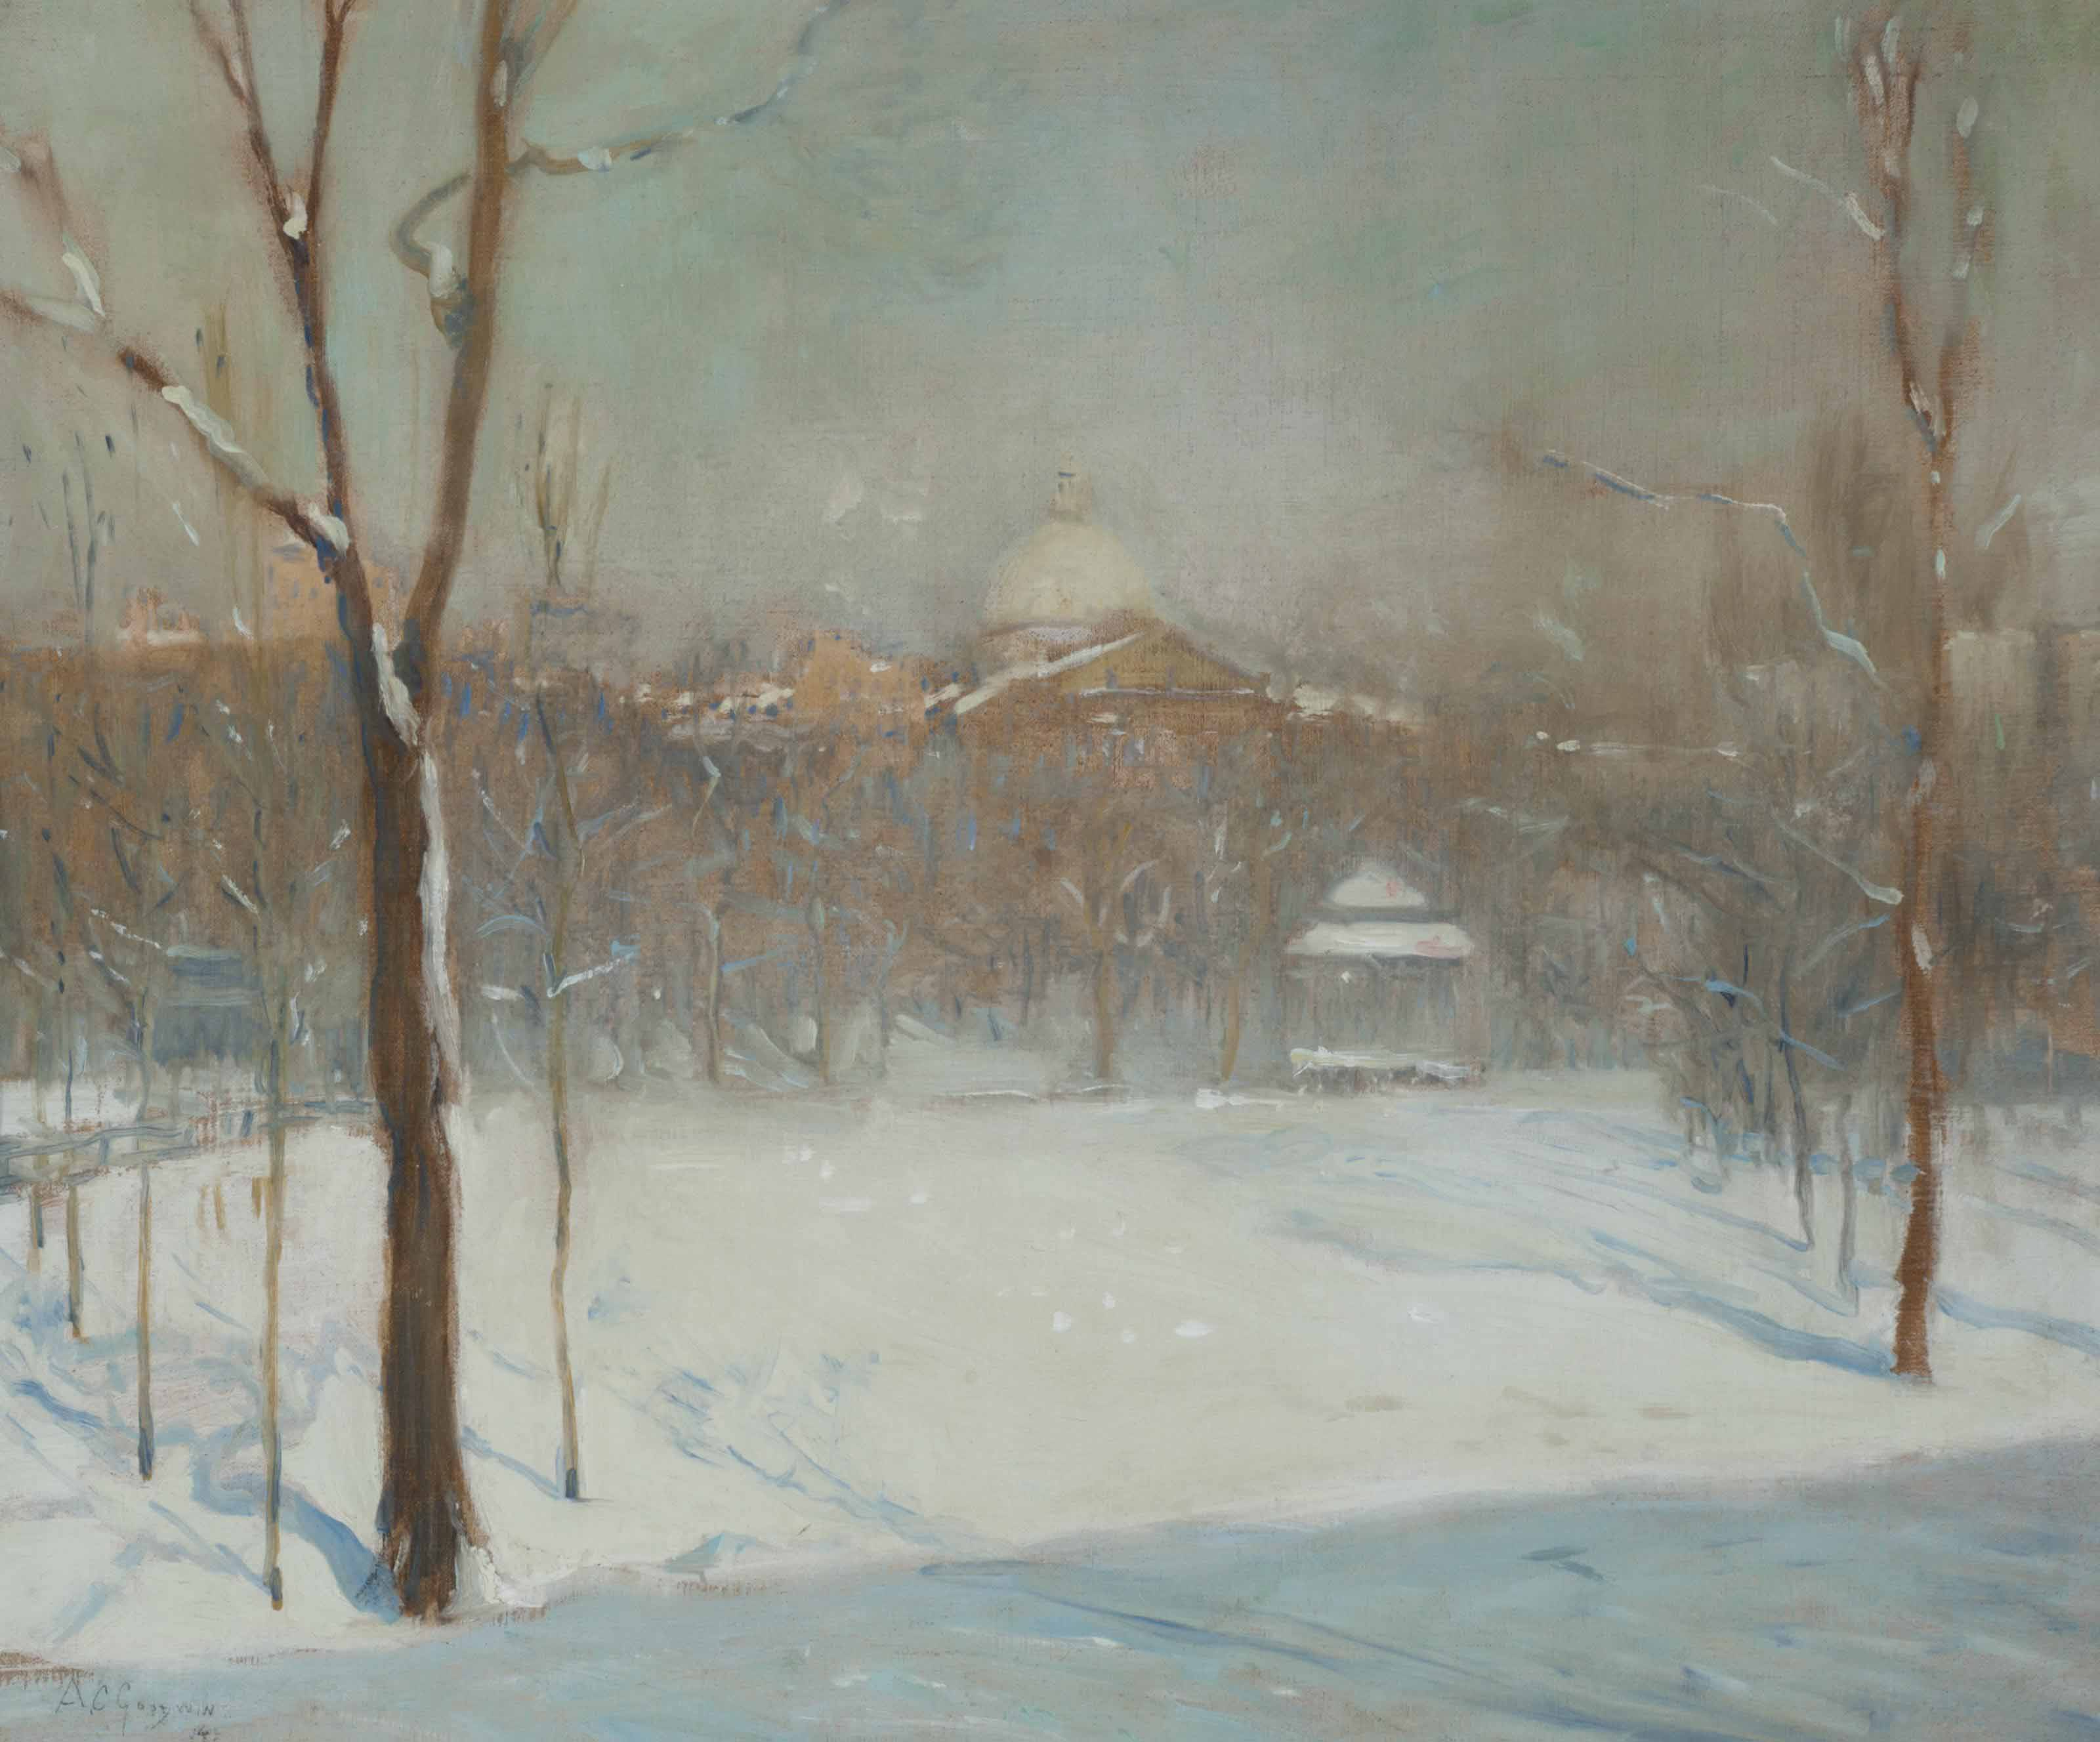 Snow on Boston Commons